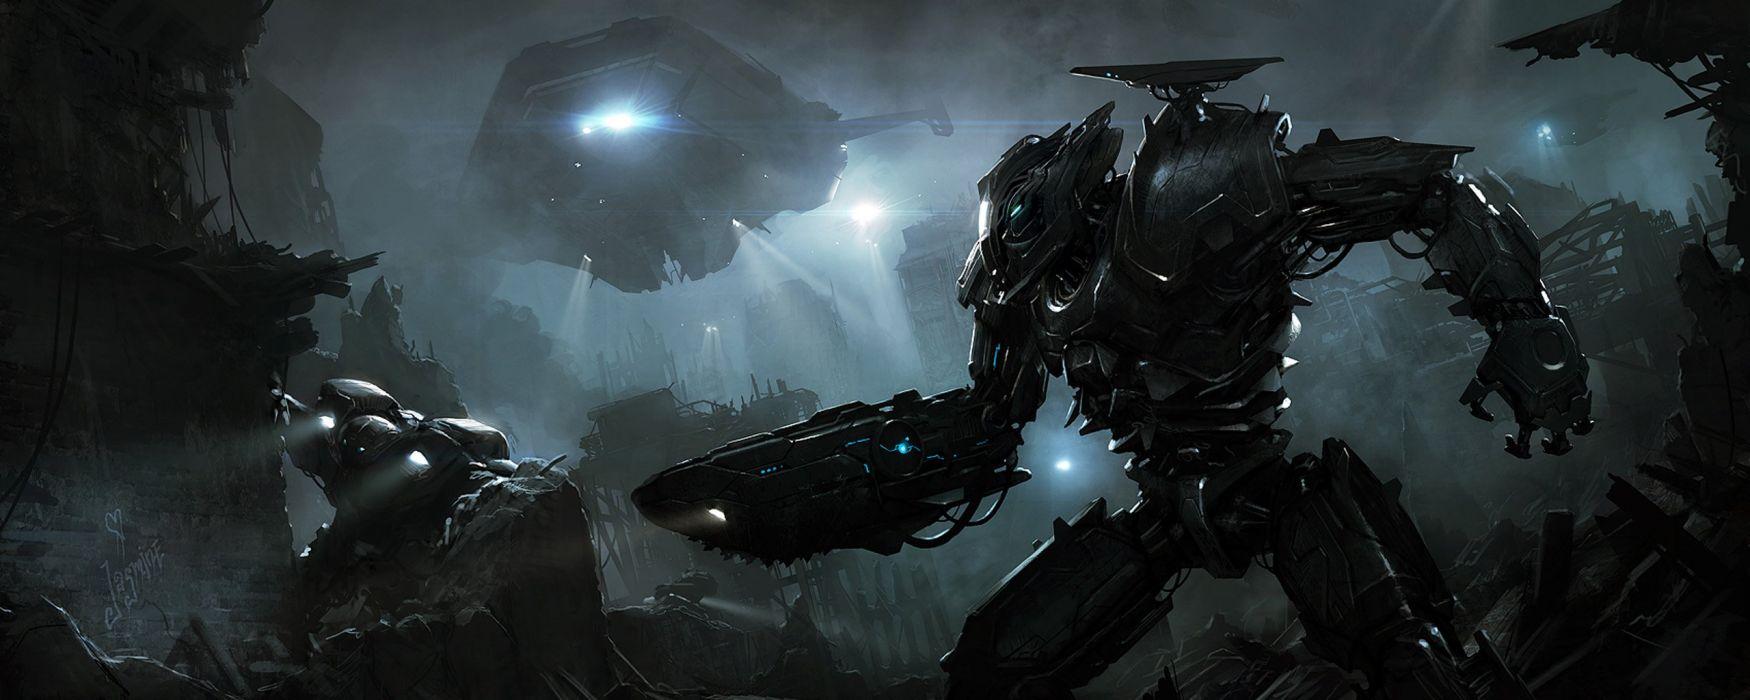 futuristic digital art science fiction Andree Wallin wallpaper